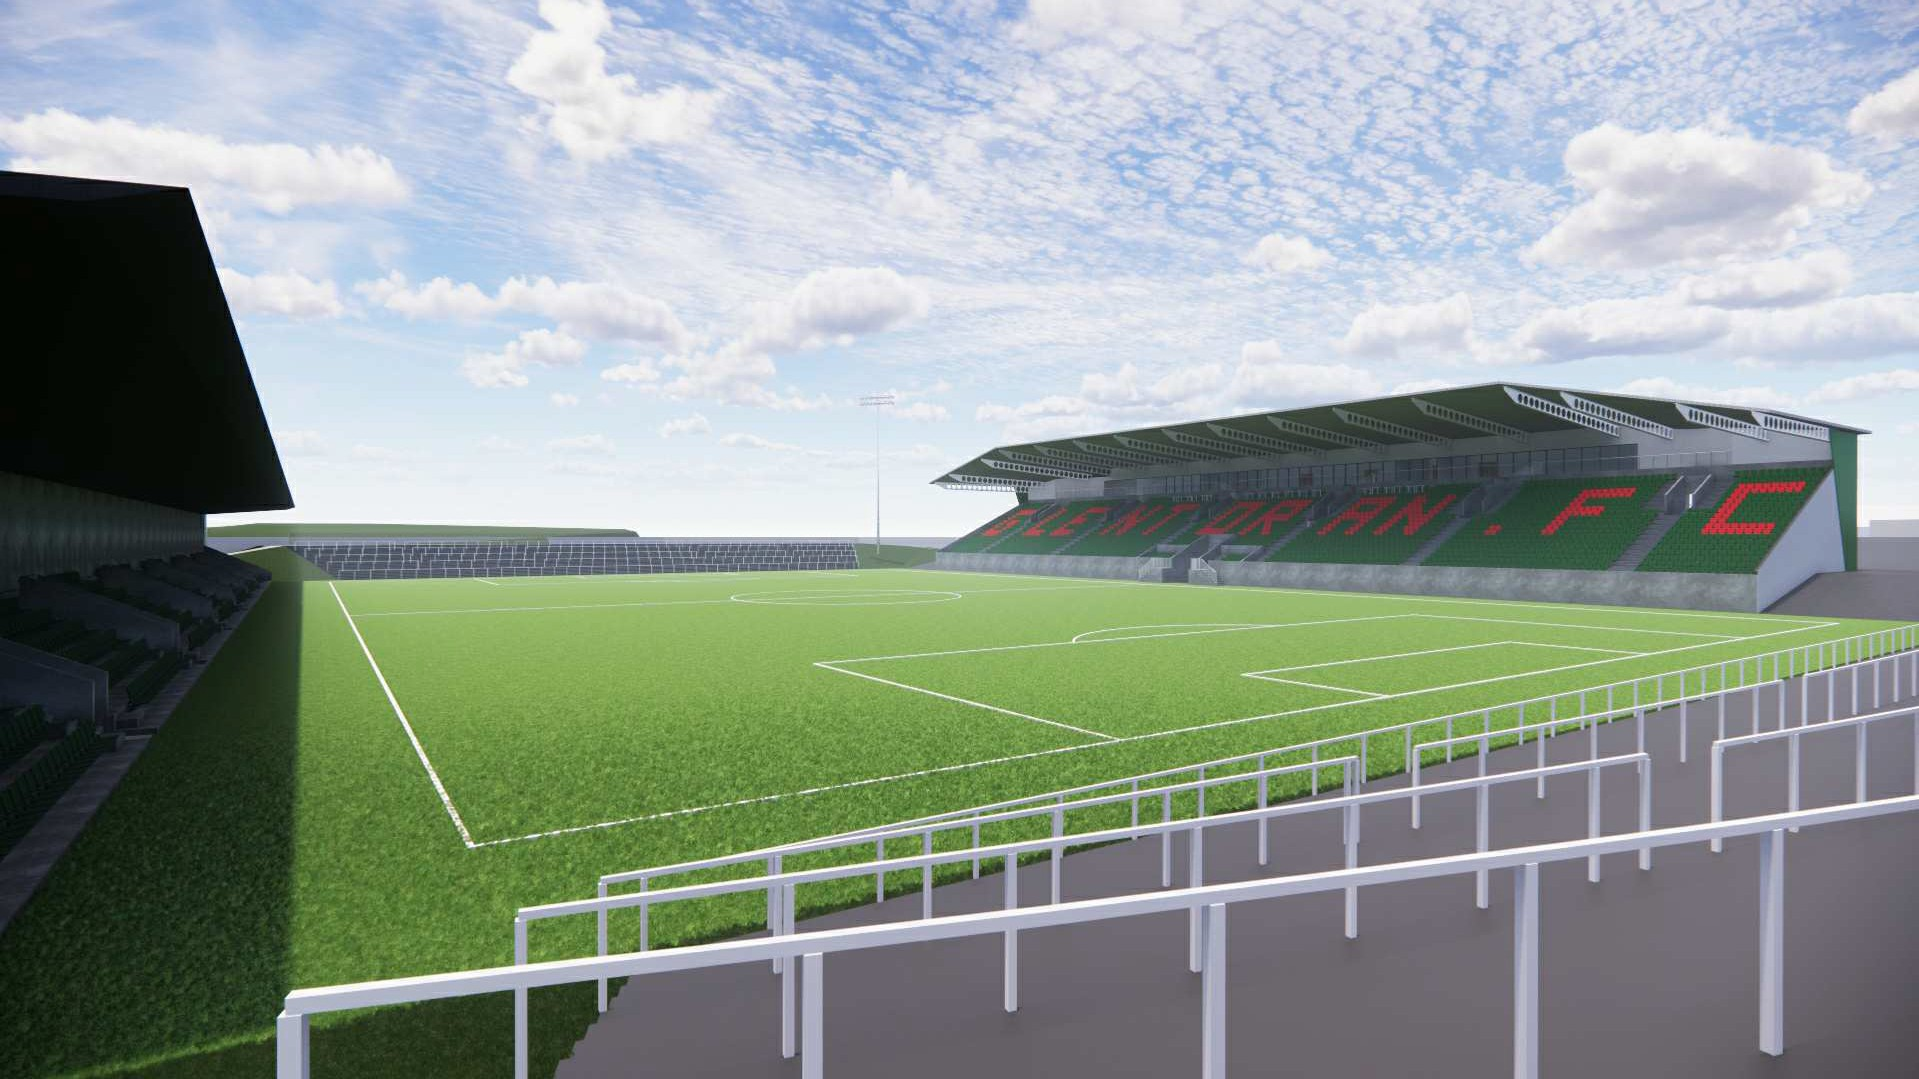 Glentoran's new Oval stadium in Belfast